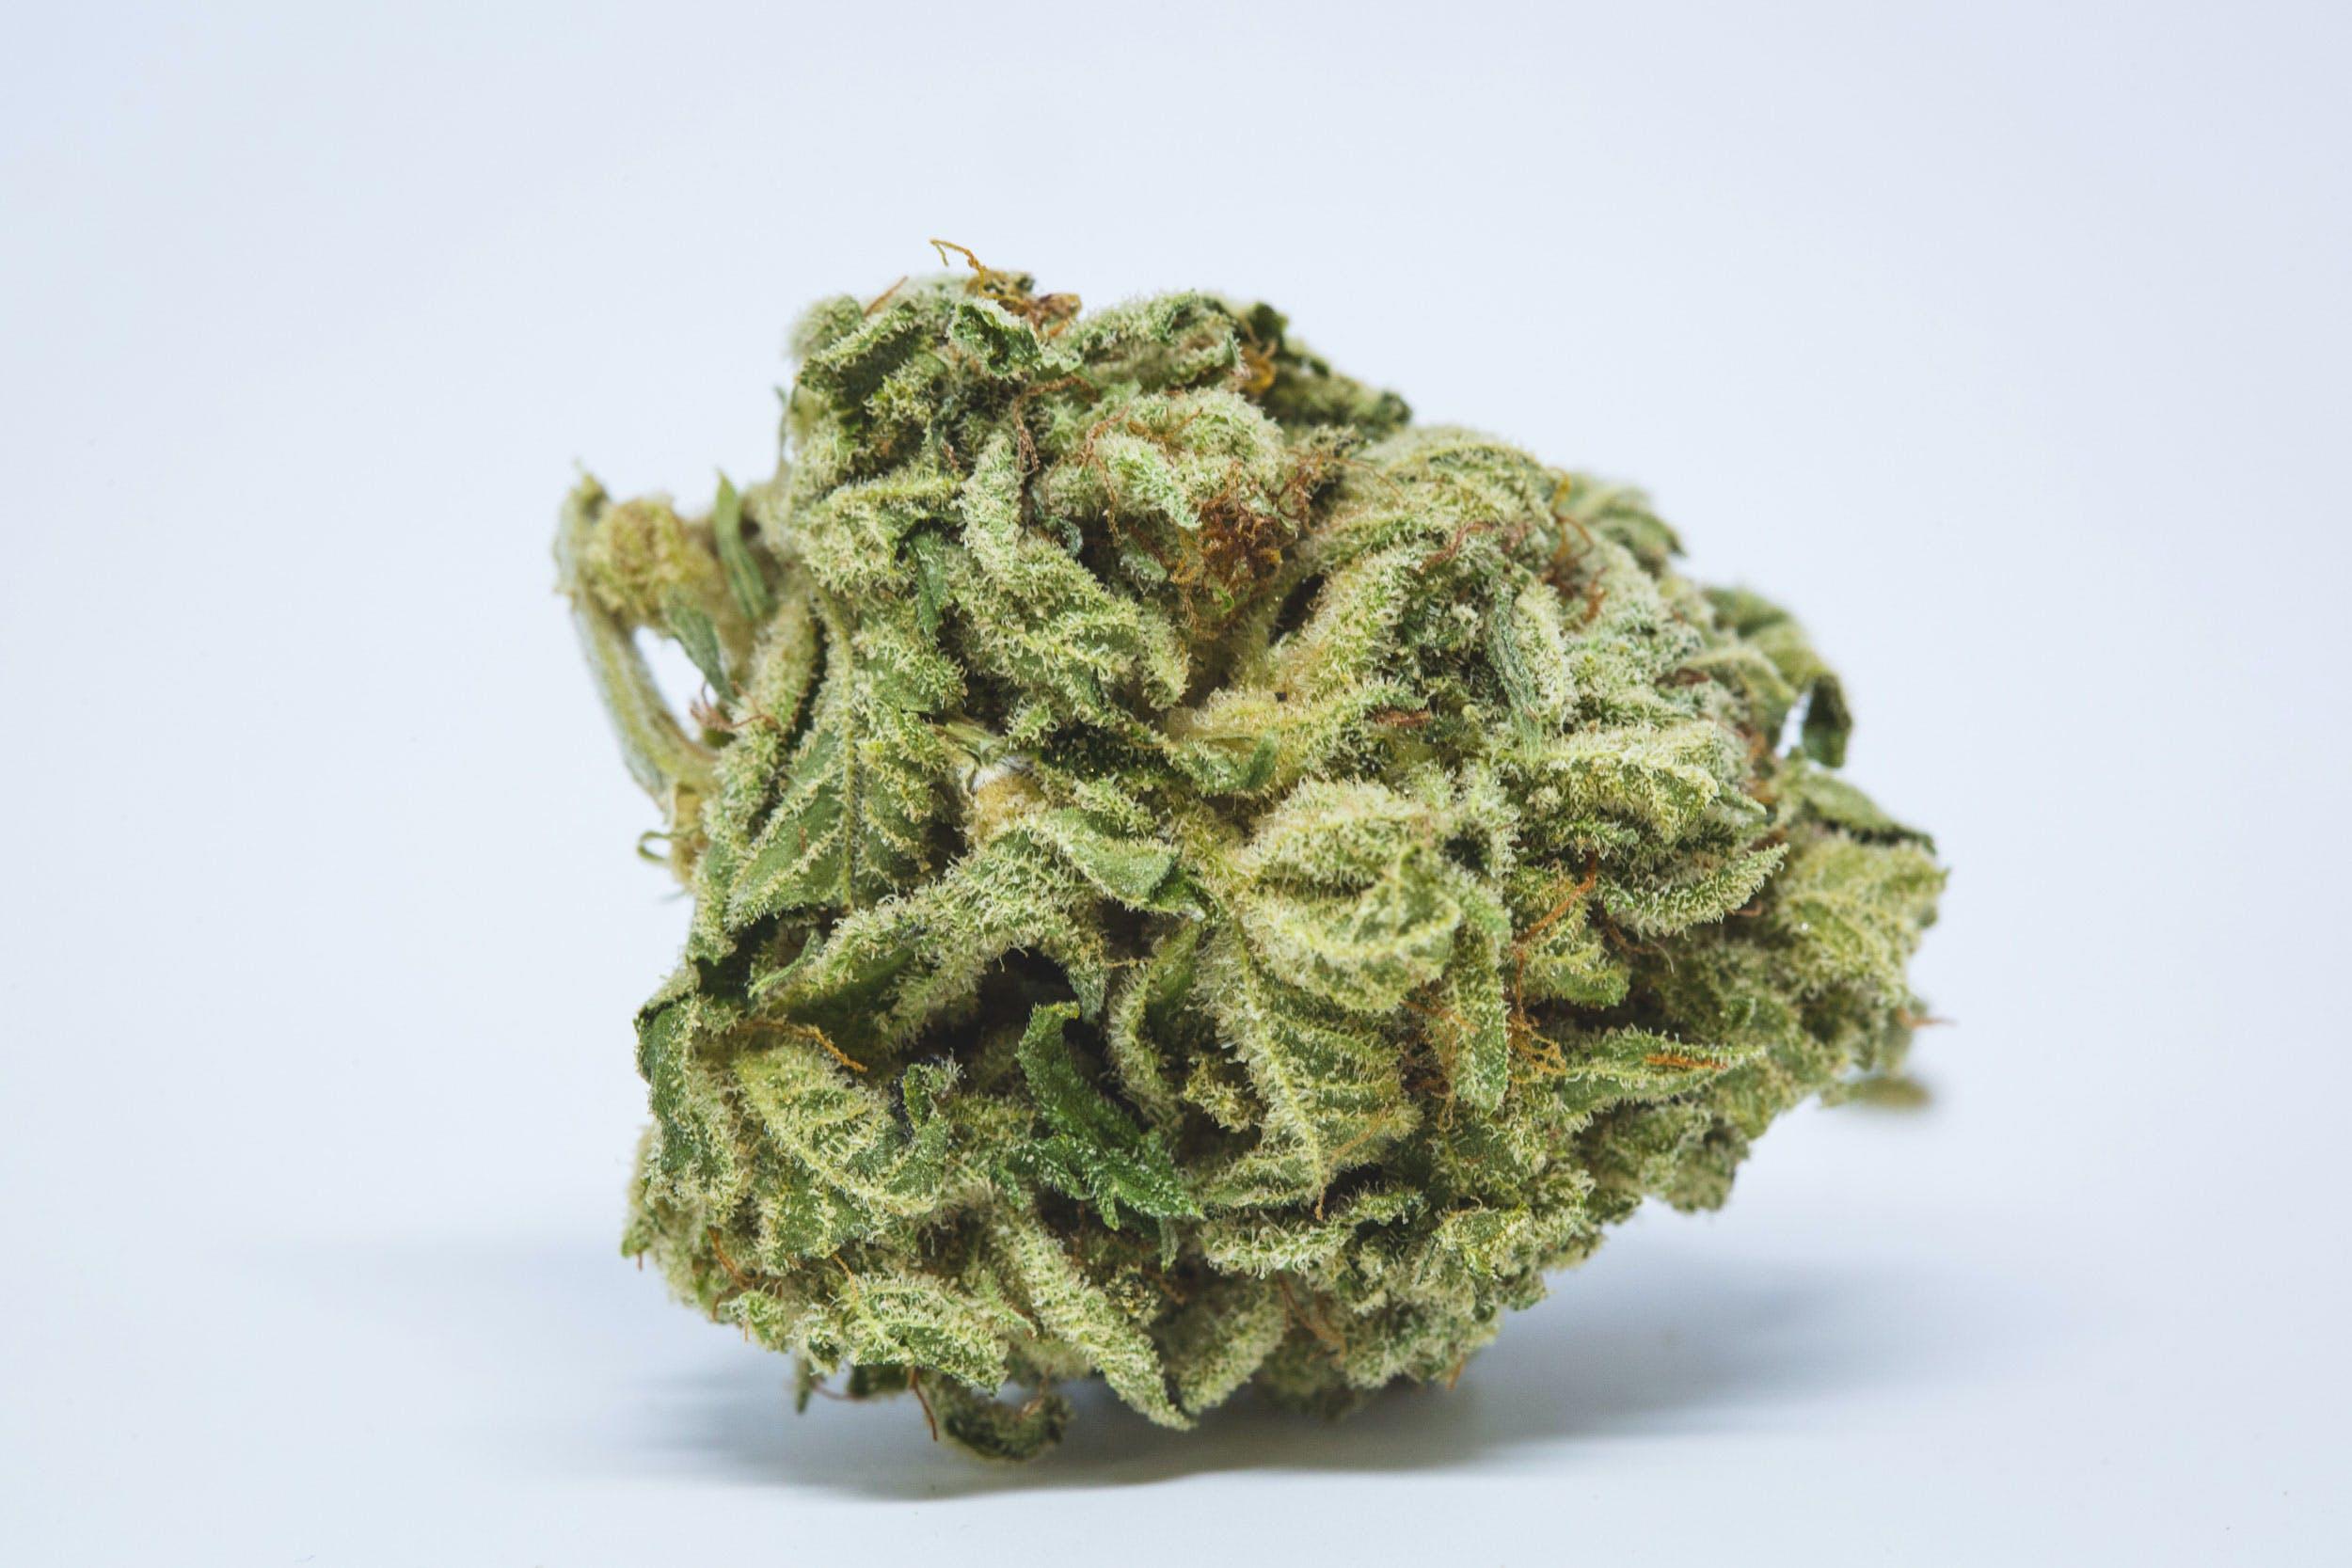 Big Bud Weed; Big Bud Cannabis Strain; Big Bud Indica Marijuana Strain